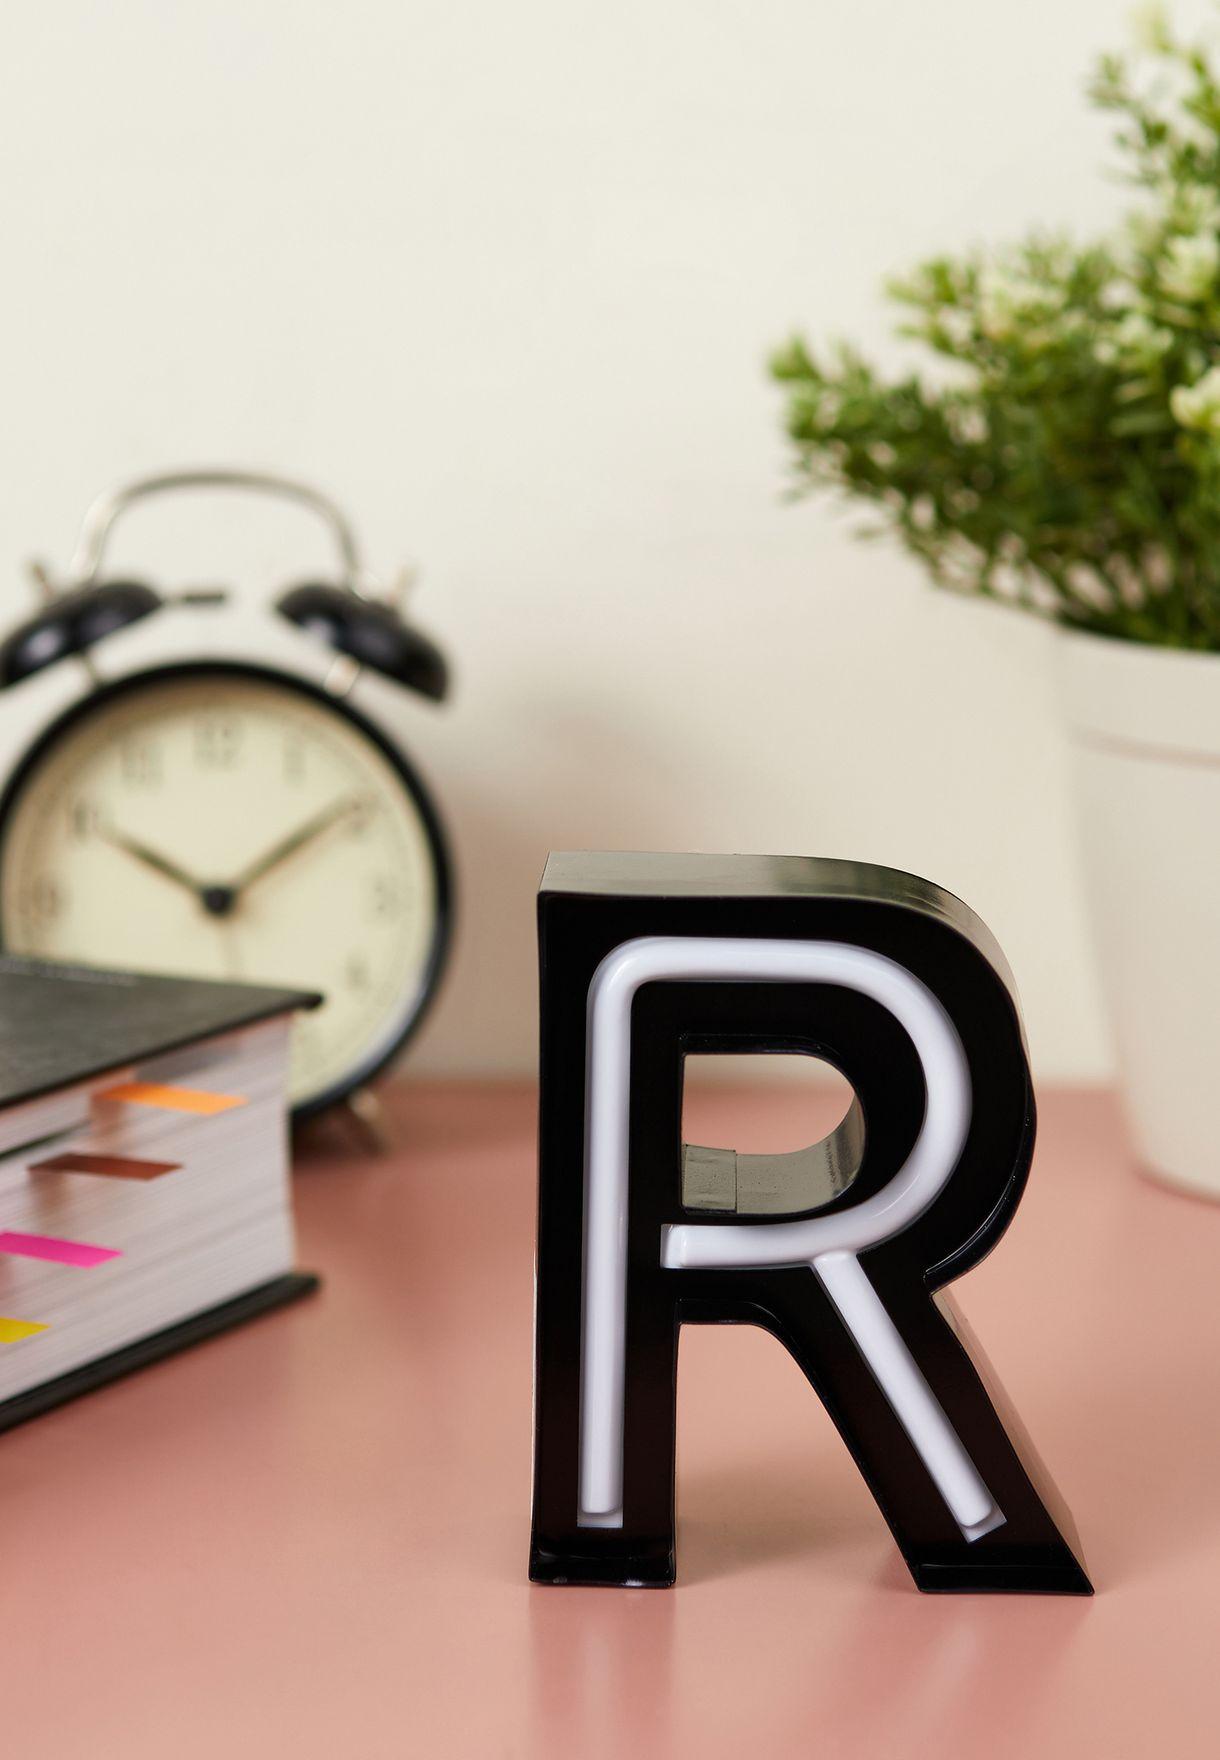 ضوء شكل حرف R